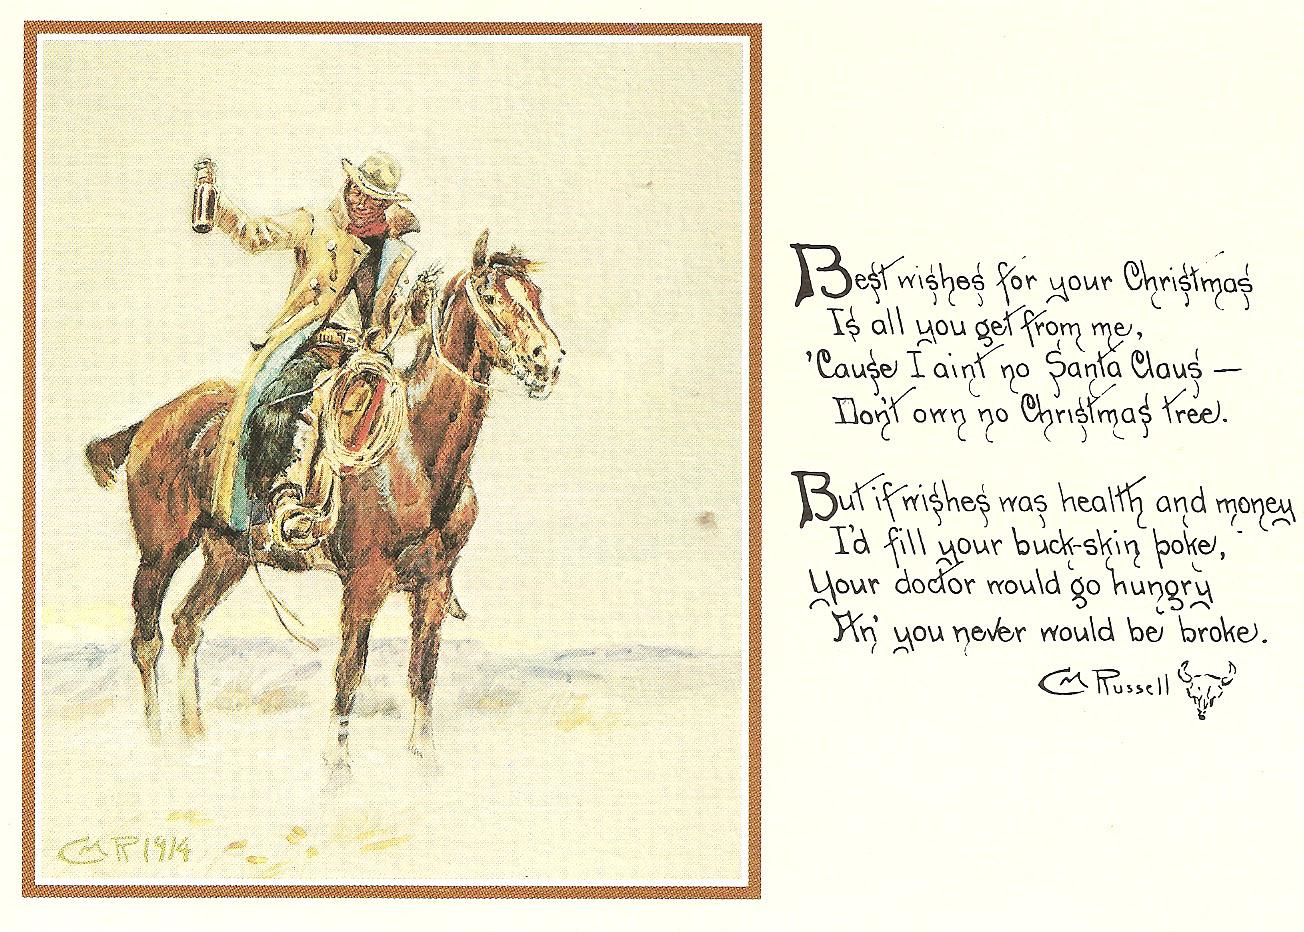 powerofbabel nannys christmas cards texas xmas - Texas Christmas Cards